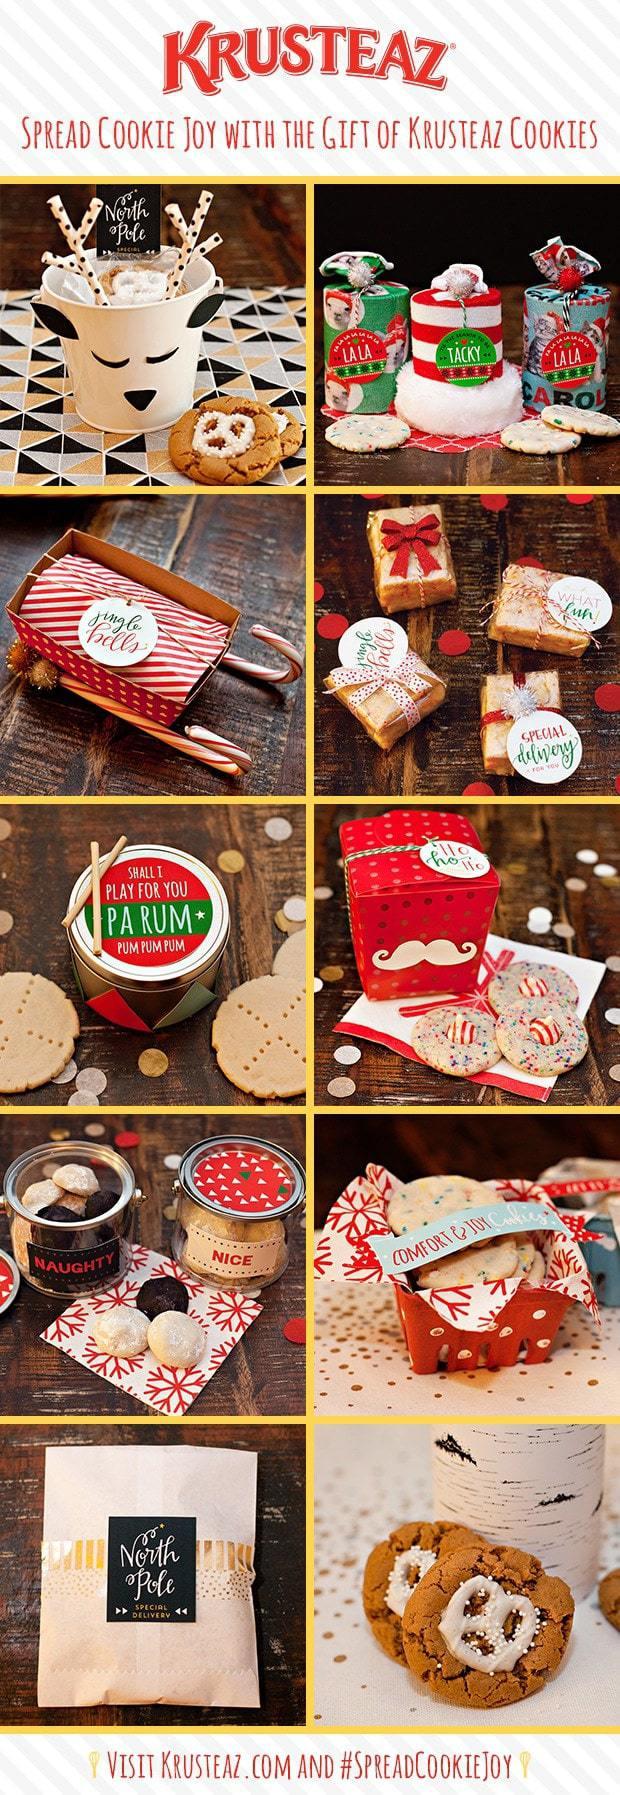 Krusteaz-Spread-Cookie-Joy-Collage-Image